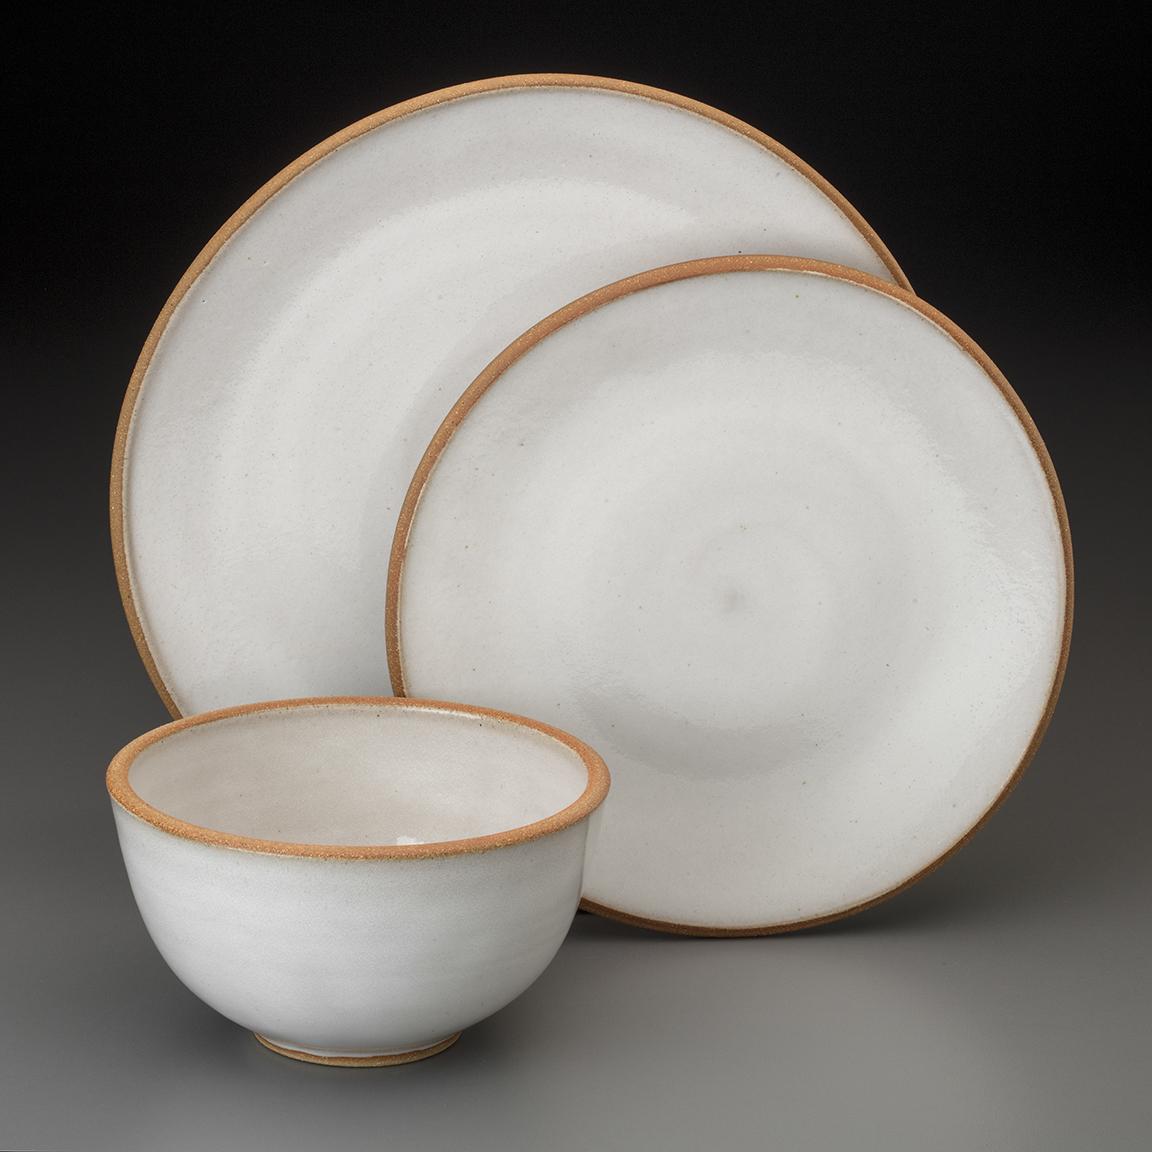 dinnerware with raw rim